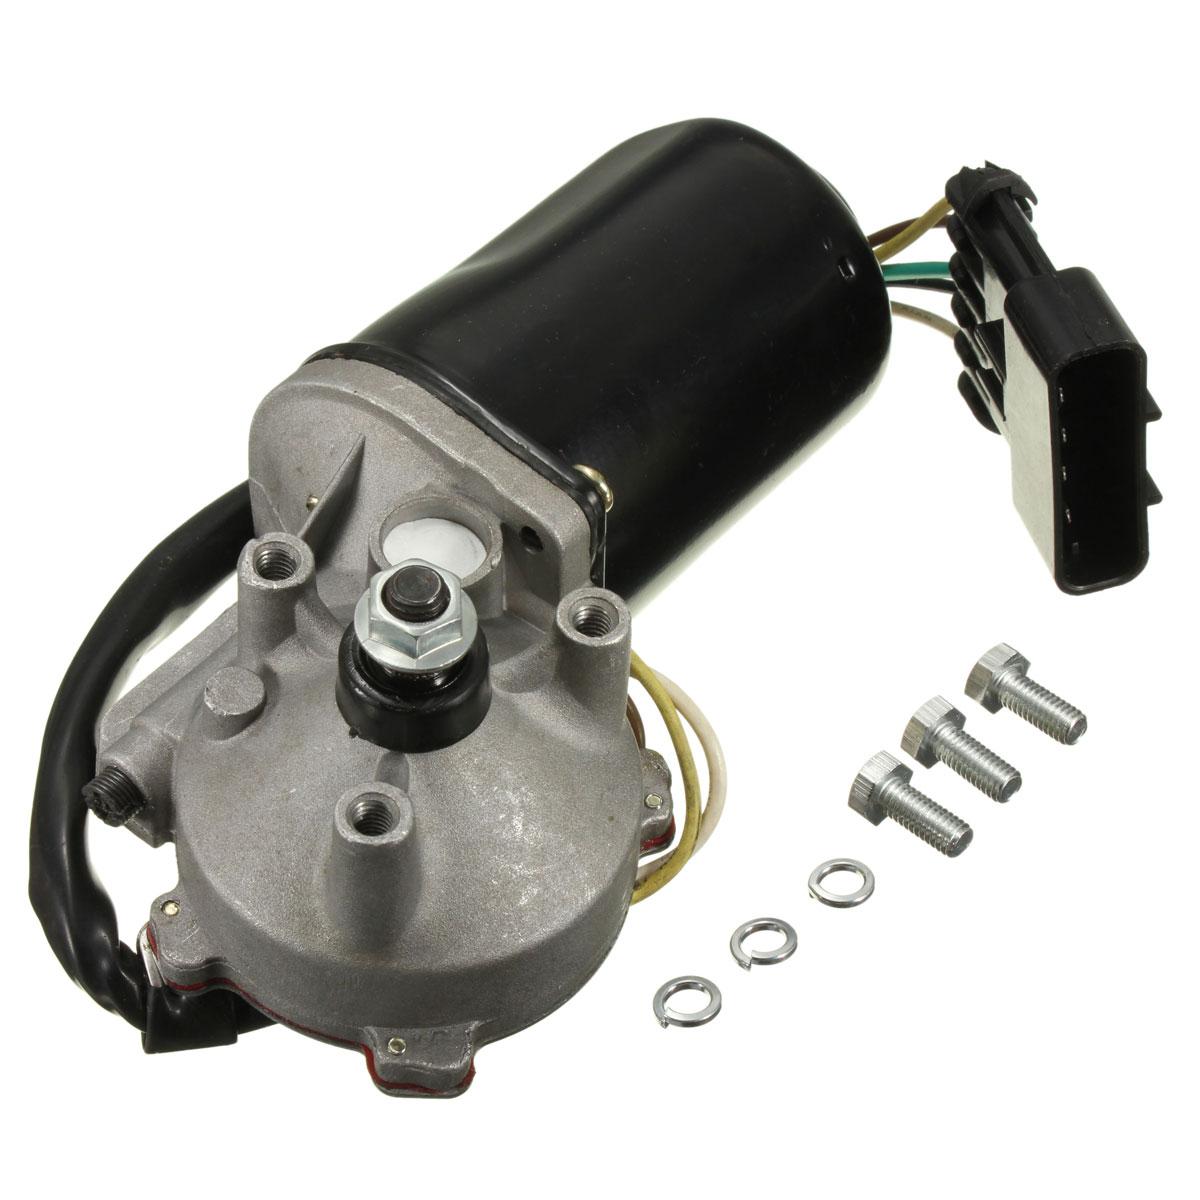 black front wiper windscreen motor for vauxhall astra g mk4 98-04 23000826  cod